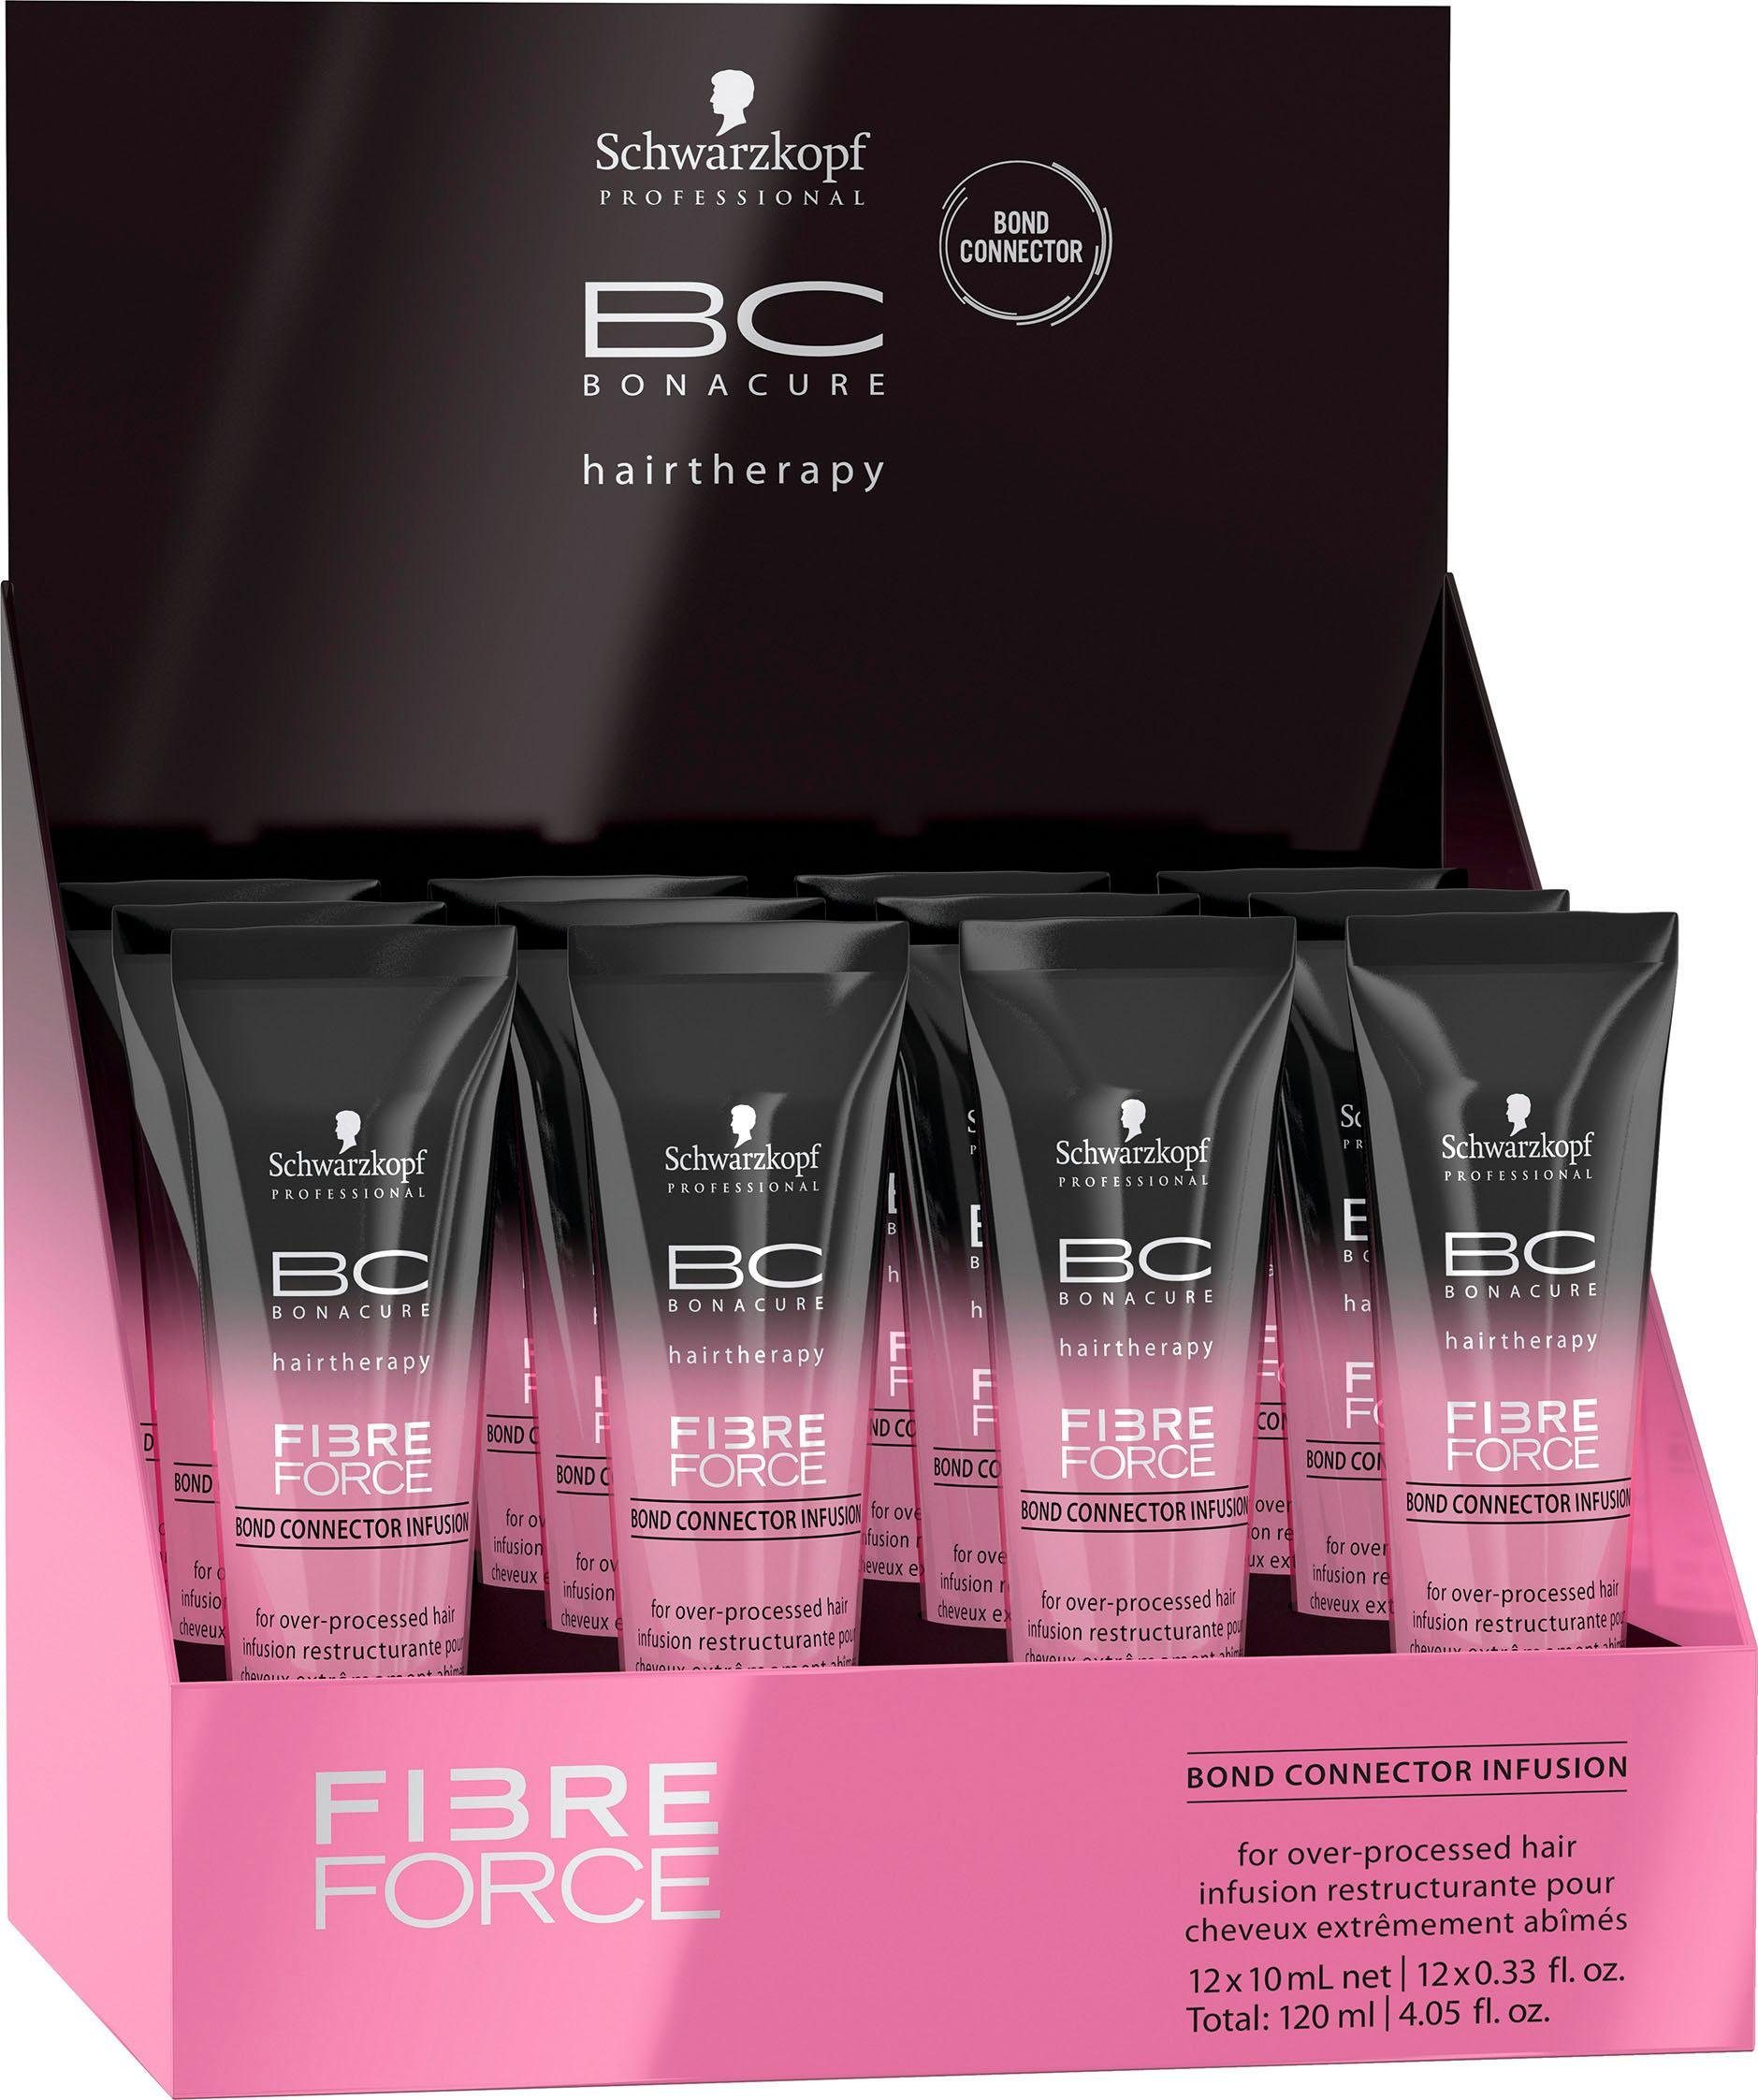 schwarzkopf professional -  Haarserum BC Bonacure Fibre Force Bond Connector Infusion, Für übermäßig behandeltes Haar